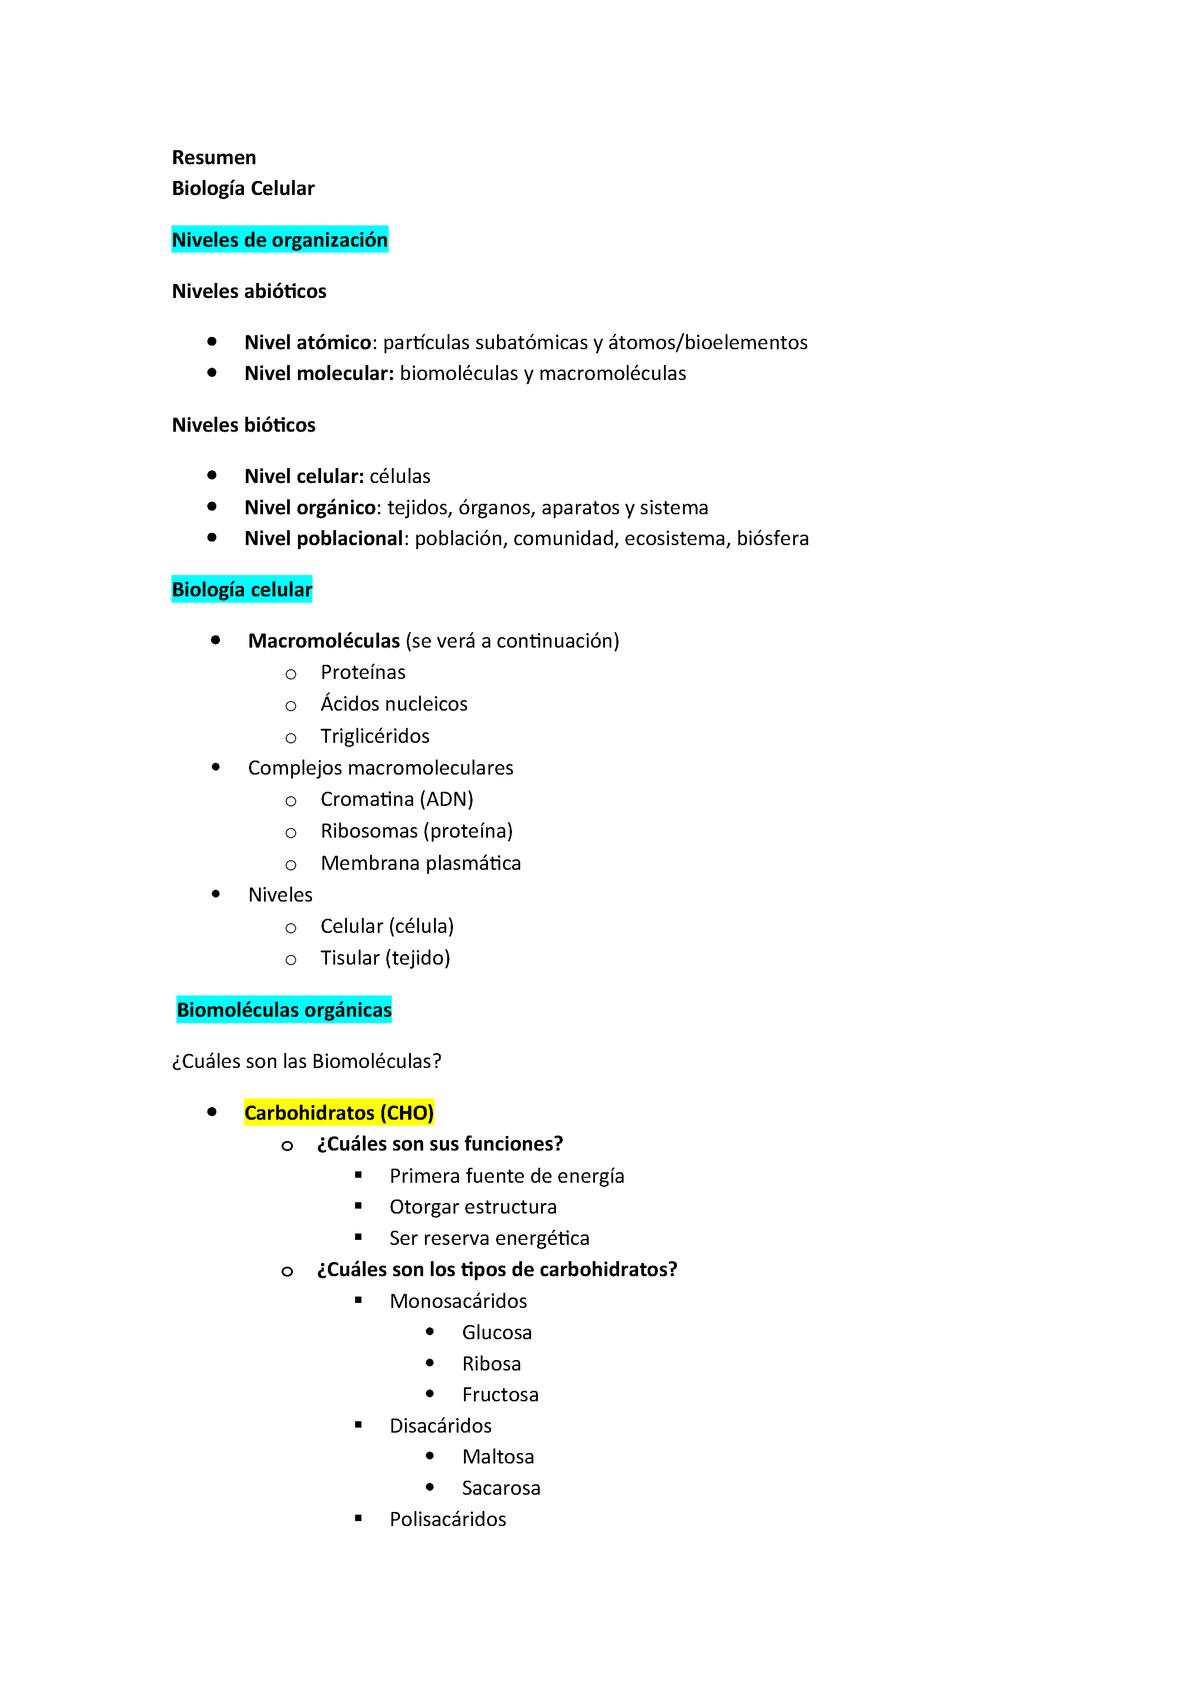 Resumen Biología Celular Upla Studocu